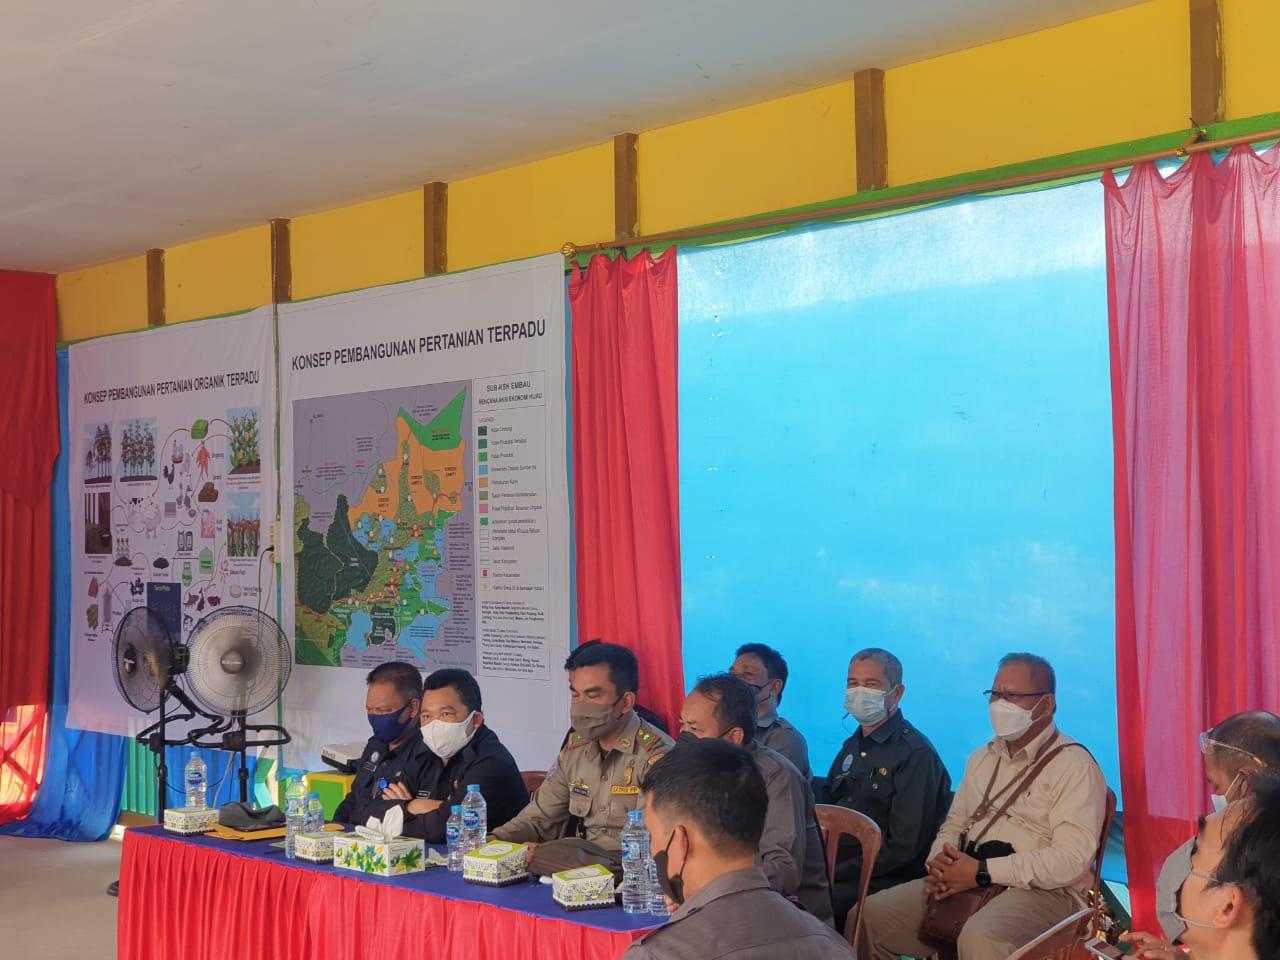 Plt Kadinkes Hadiri Kegiatan Kunjungan Kerja Bupati ke Kecamatan Hulu Gurung